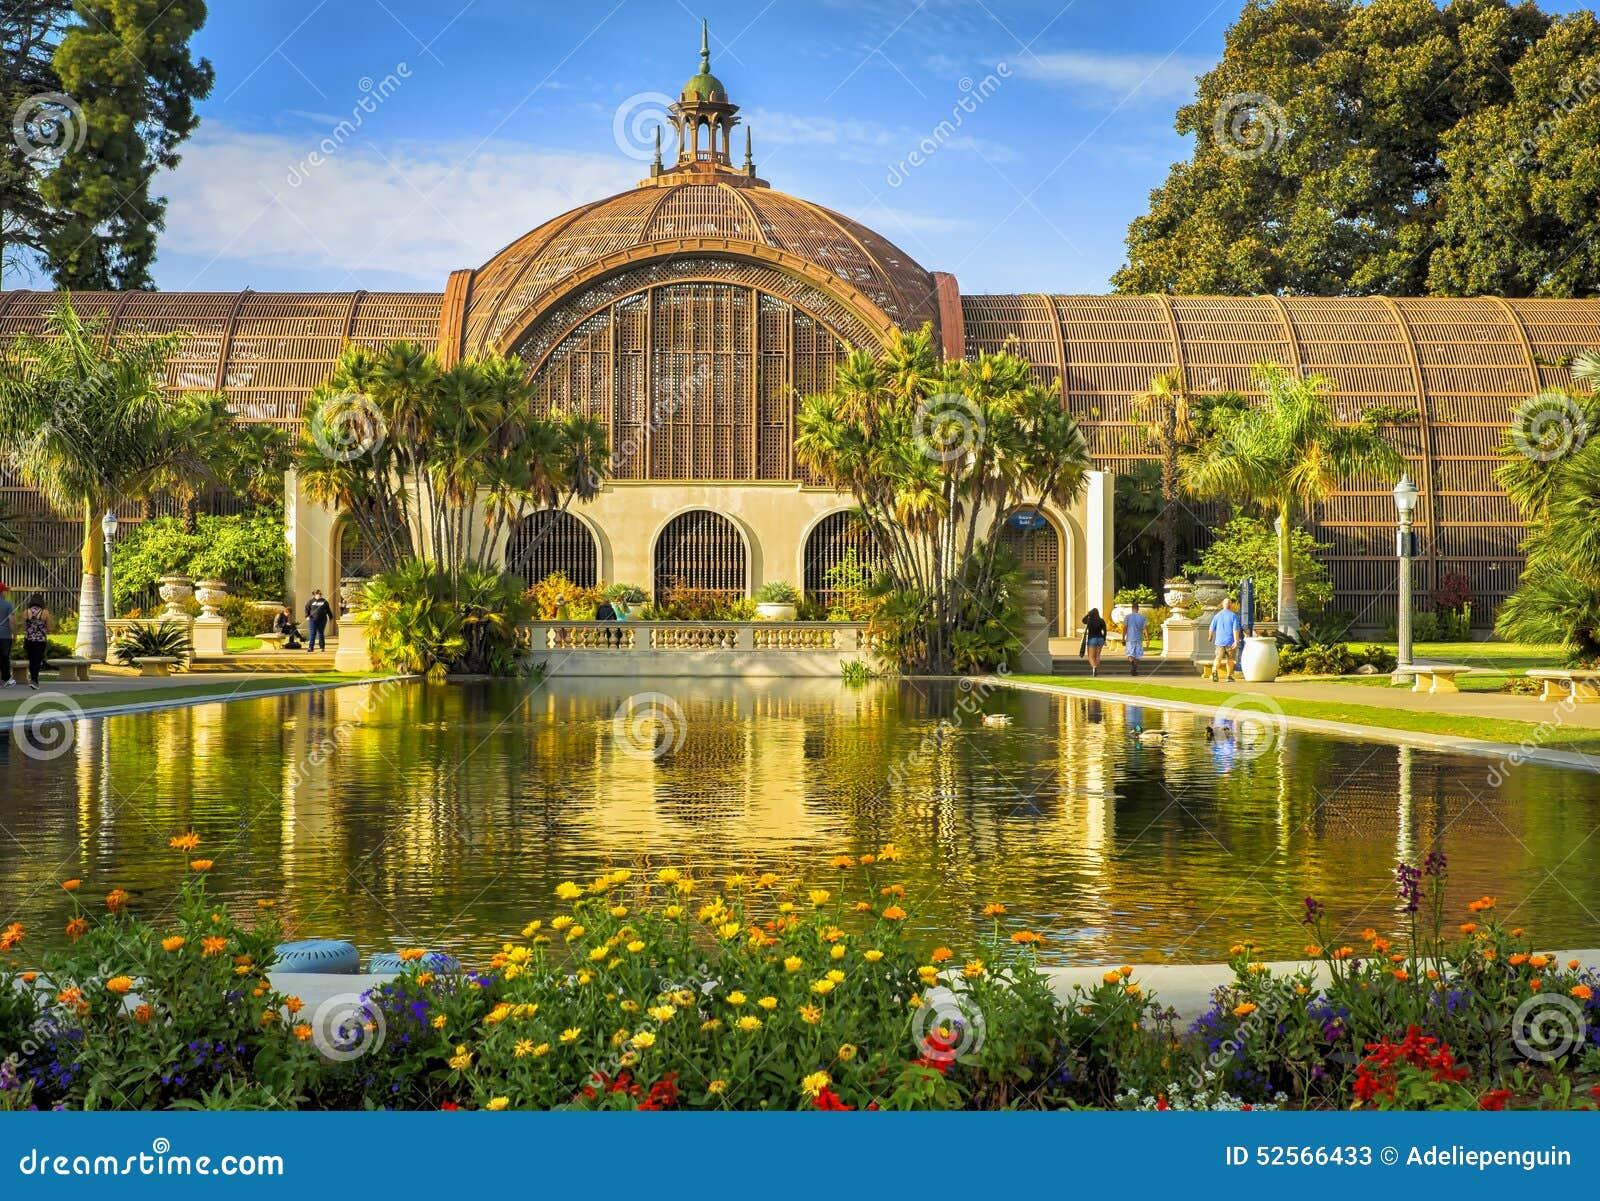 Balboa Park San Diego Botanical Building Editorial Stock